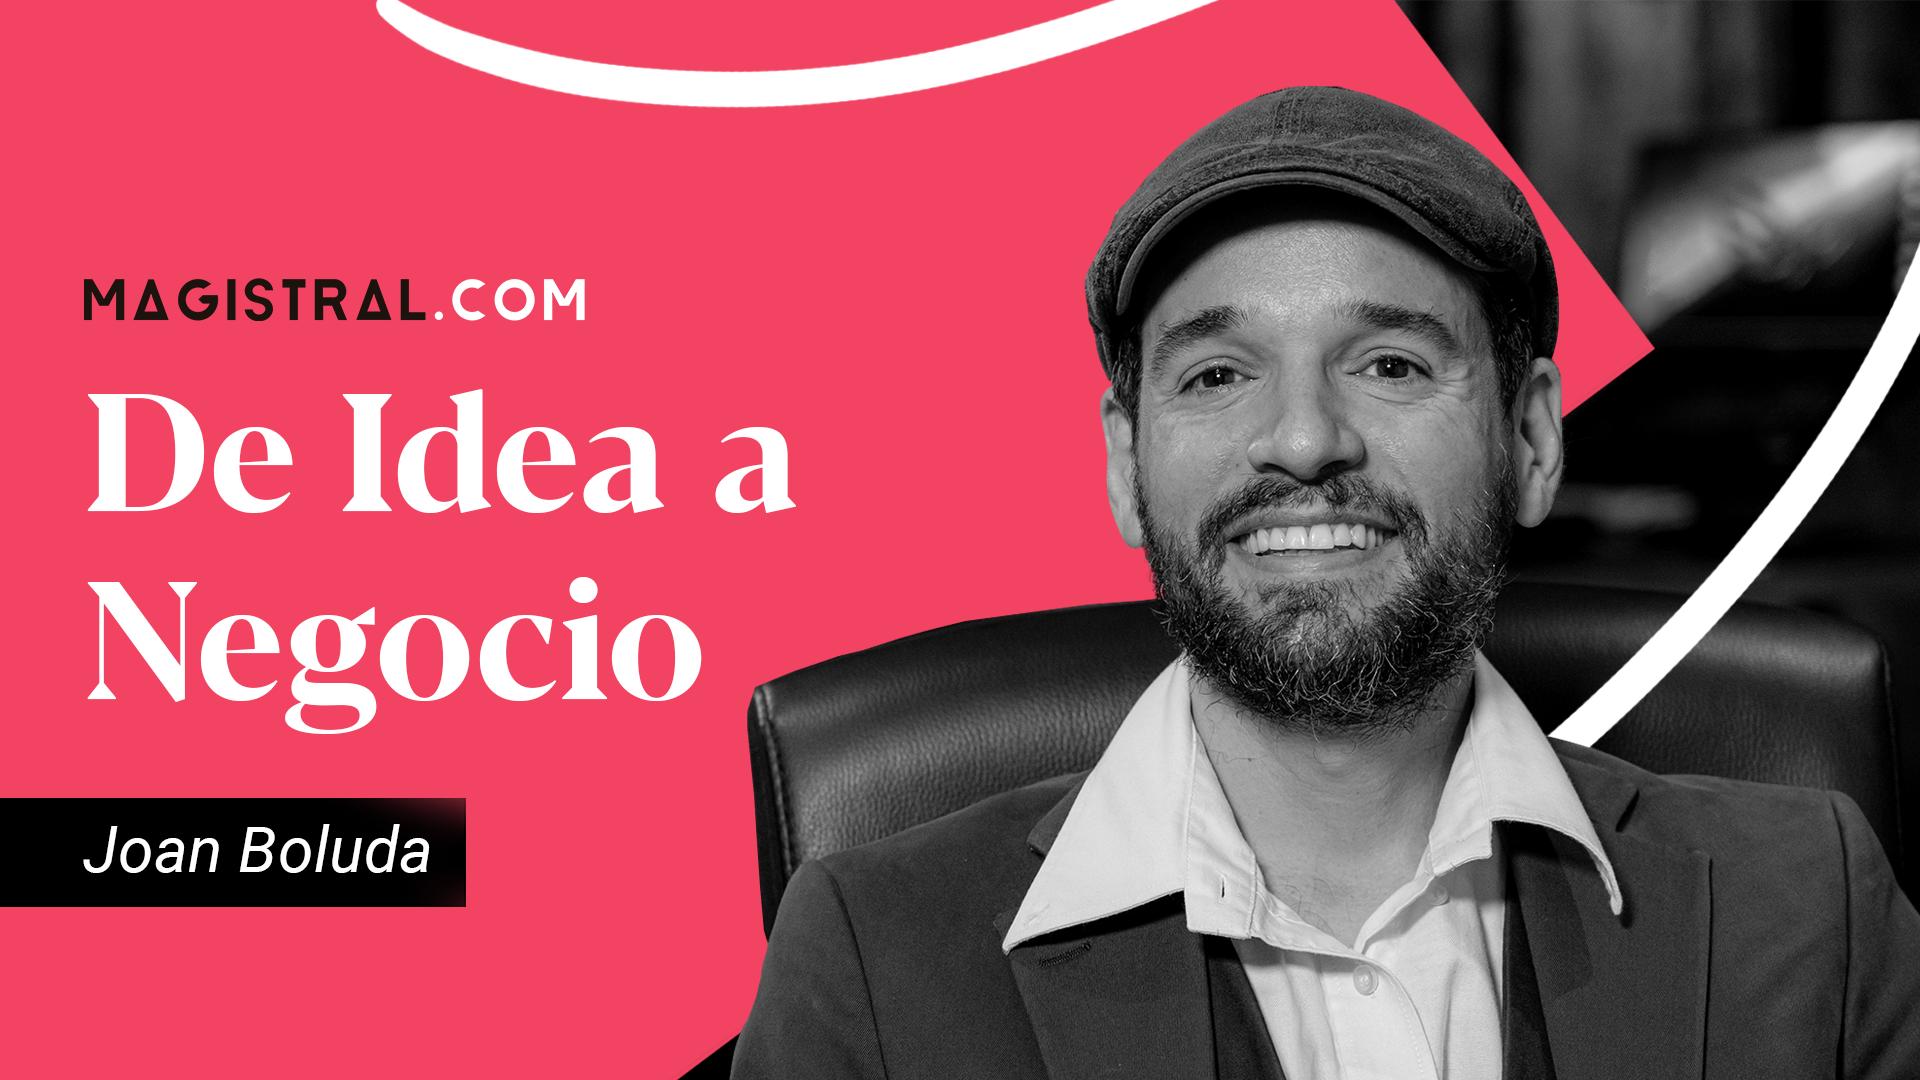 Joan Boluda, consultor de marketing online, fundador de boluda.com, el portal de cursos de marketing online